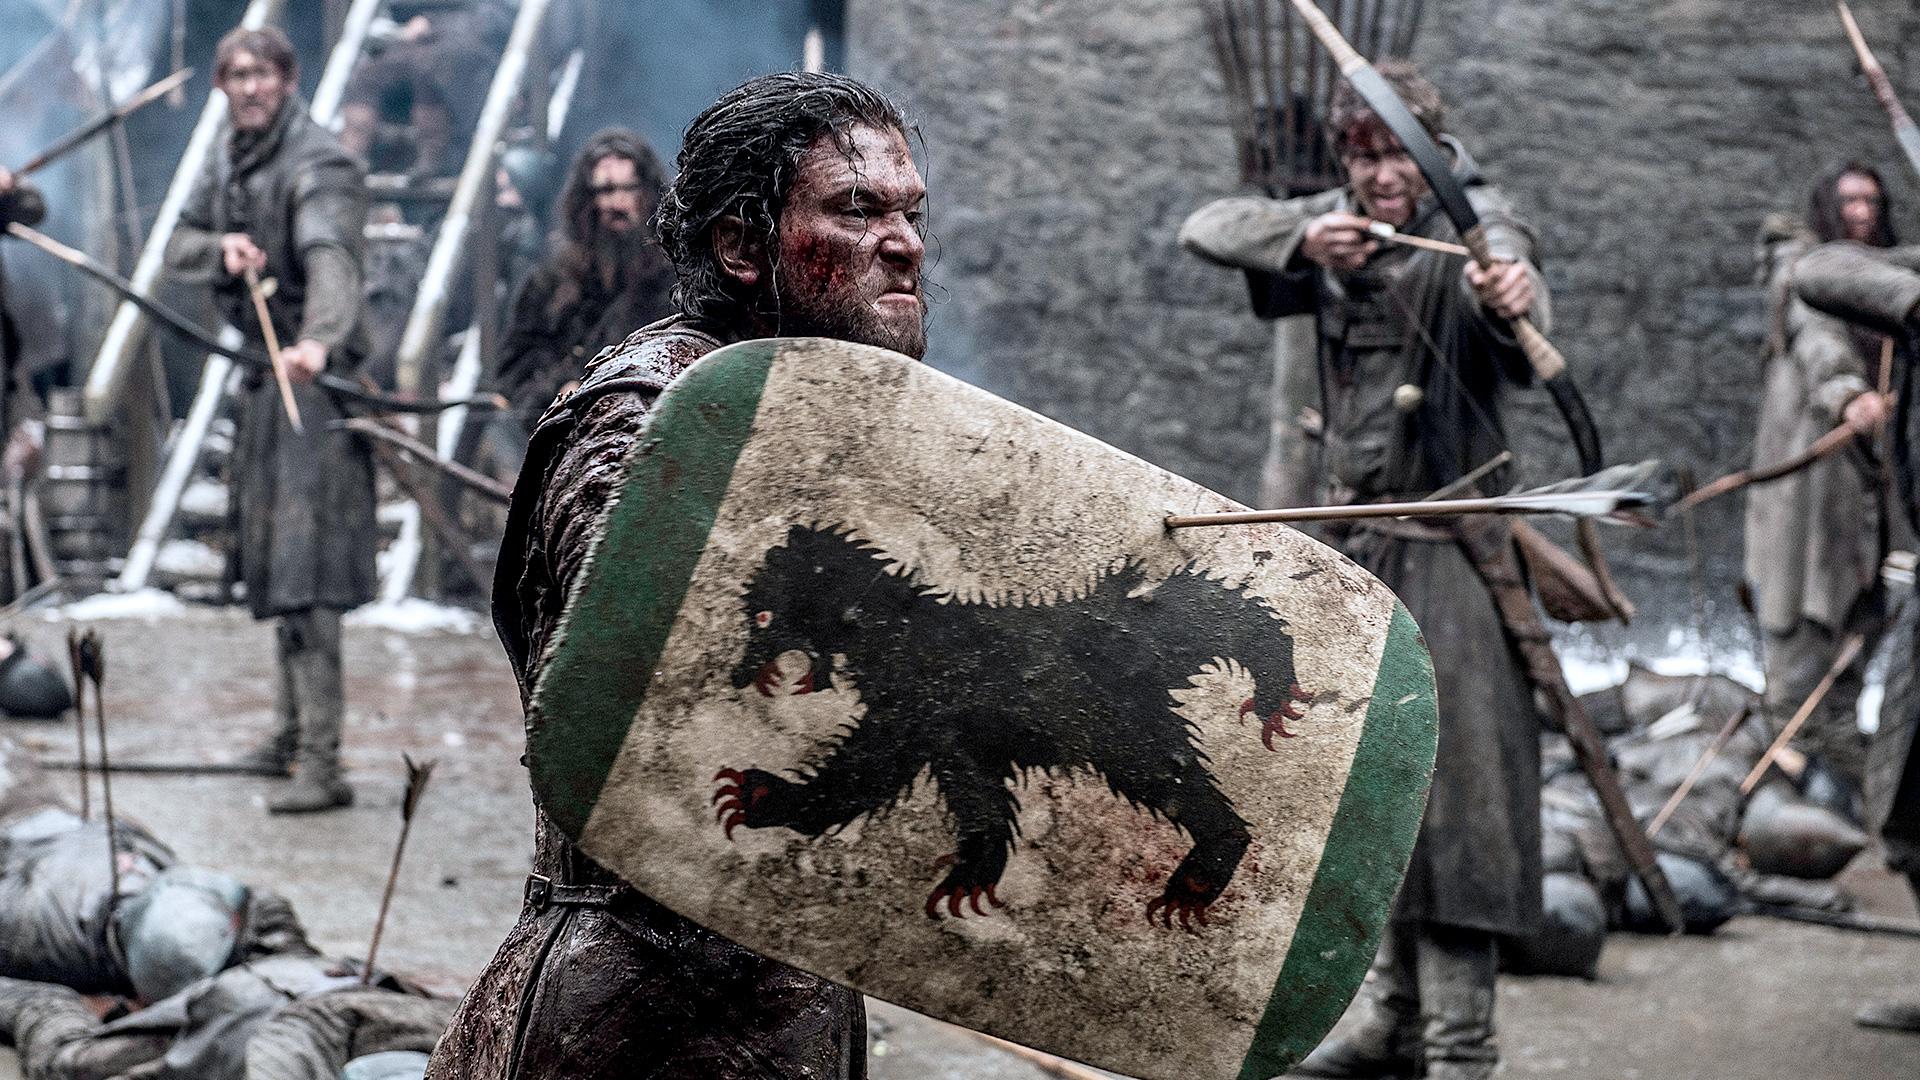 Jon Snow Battle Of The Bastards, HD Tv Shows, 4k